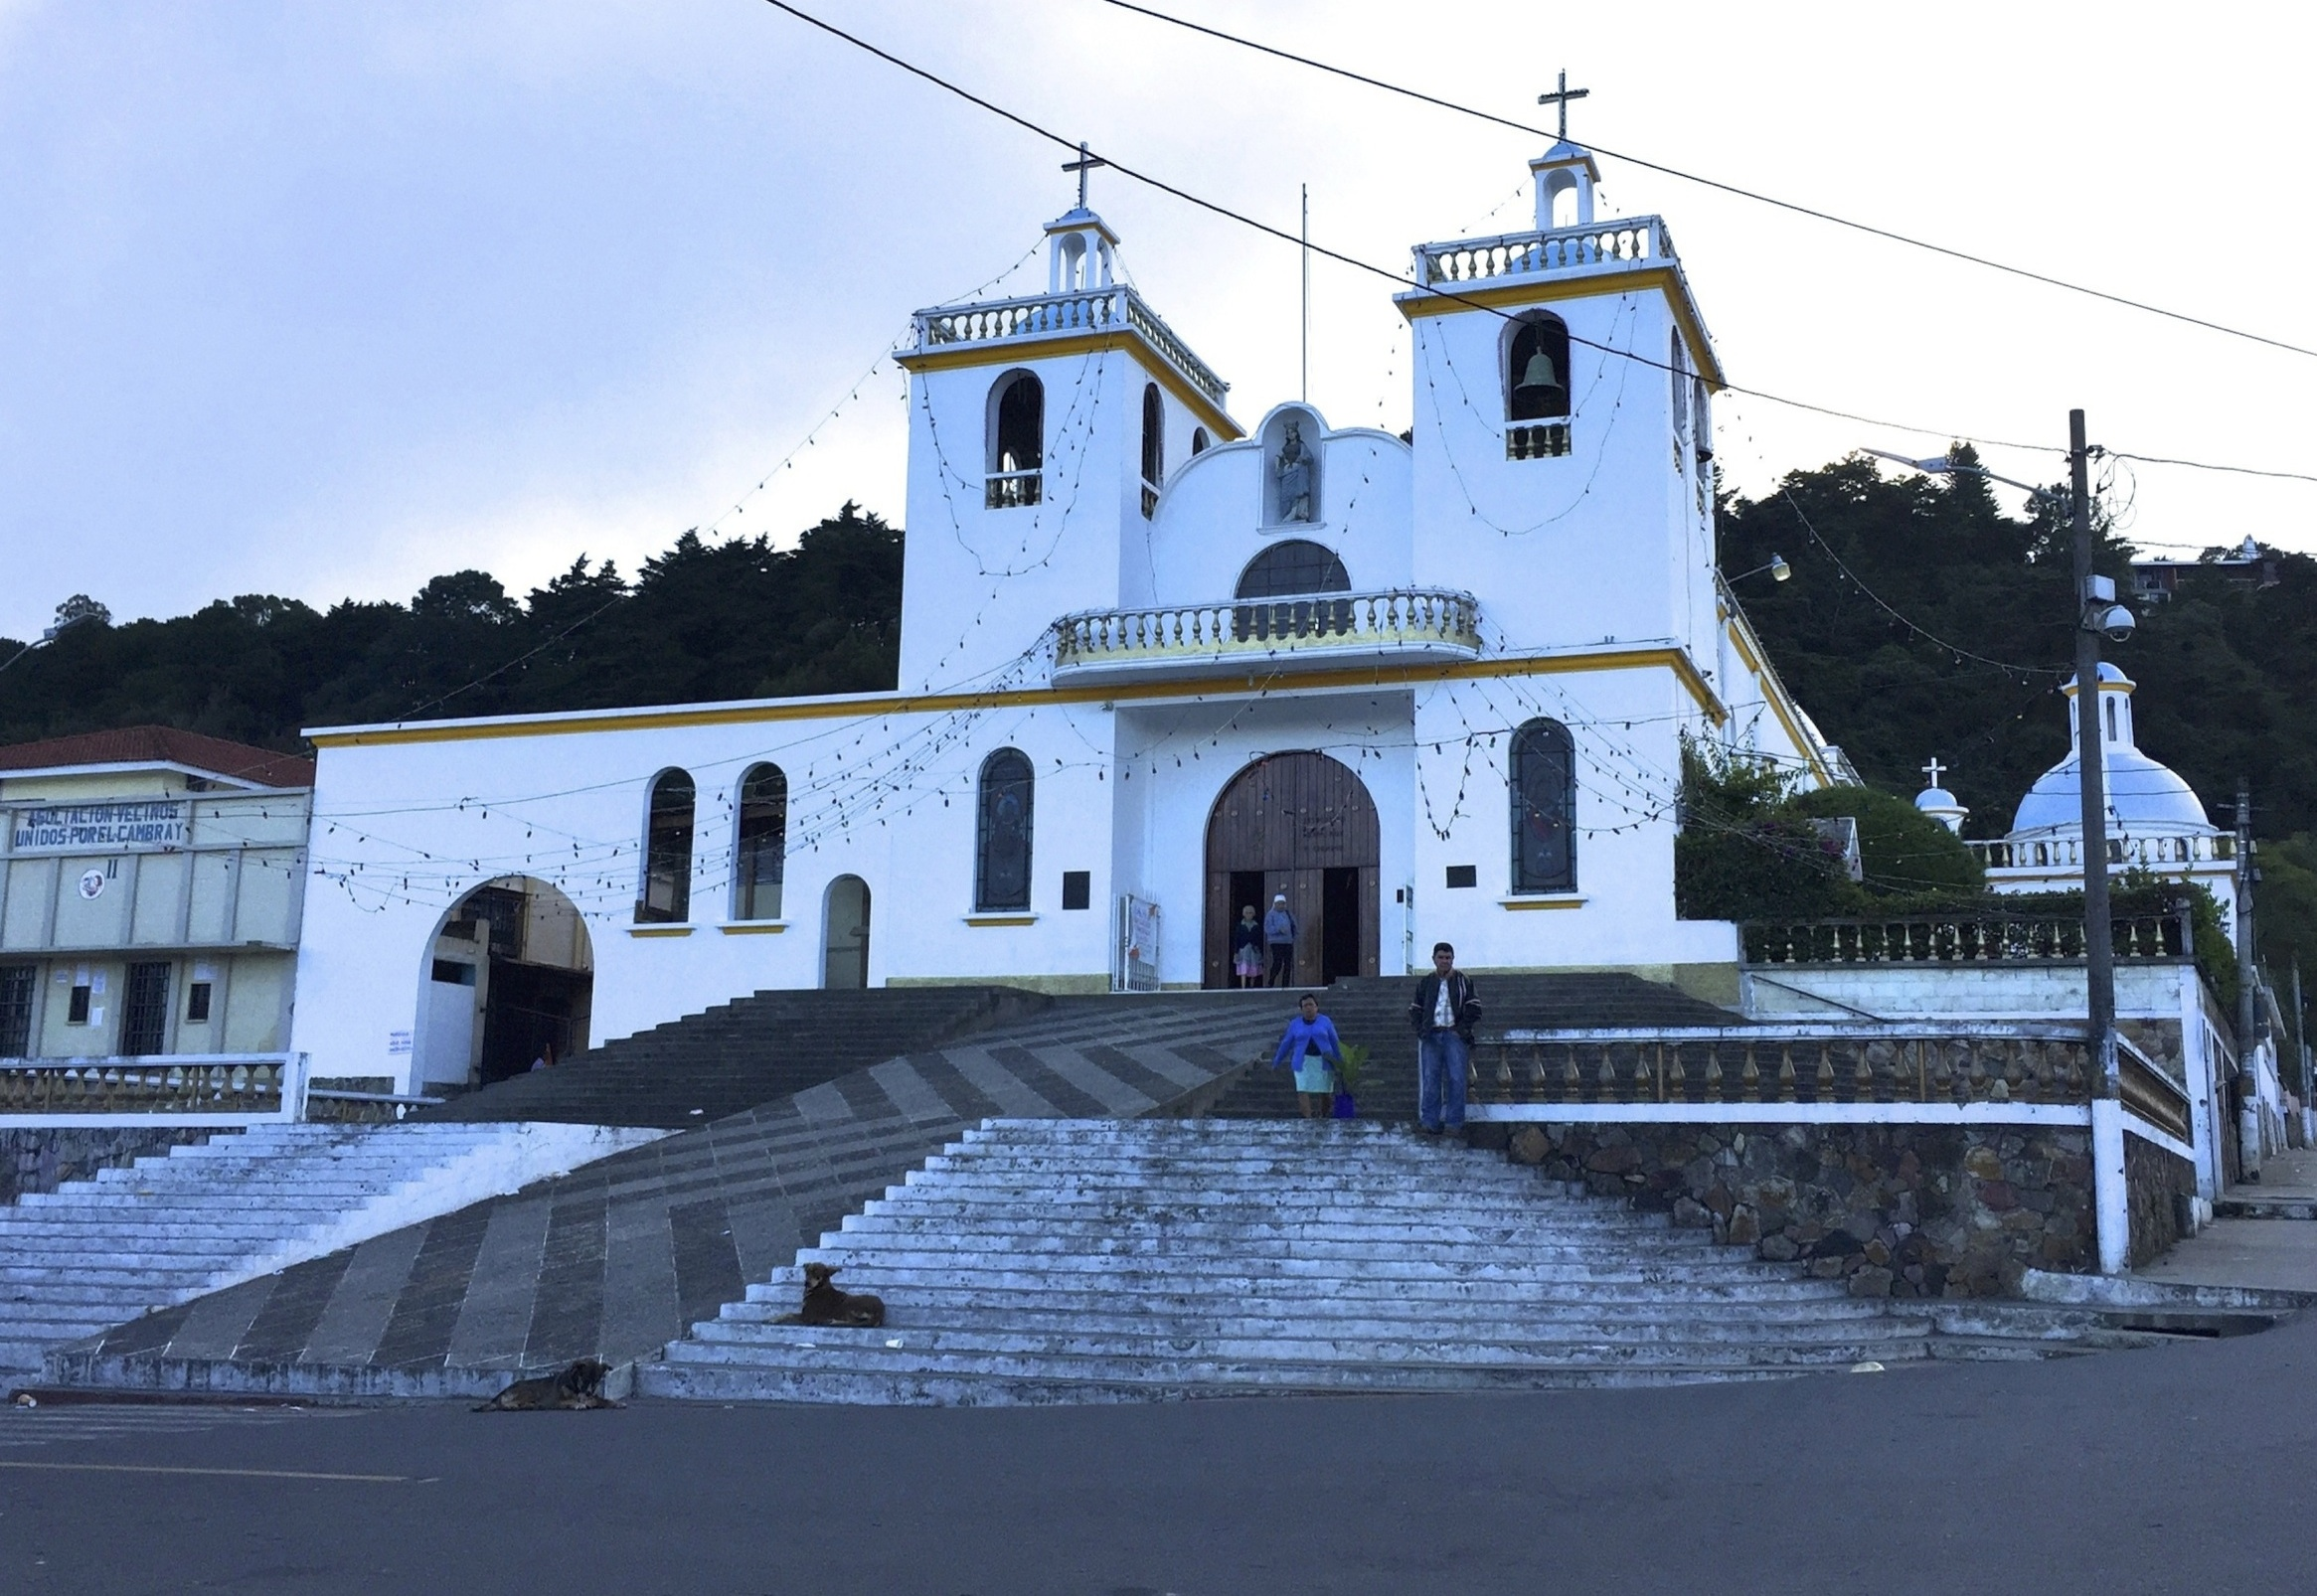 GHF Mobile Clinic Albergue Municipal (Temporary Homeless Shelter) ◆ Santa Catarina, Pinula Guatemala ◆ November 2015